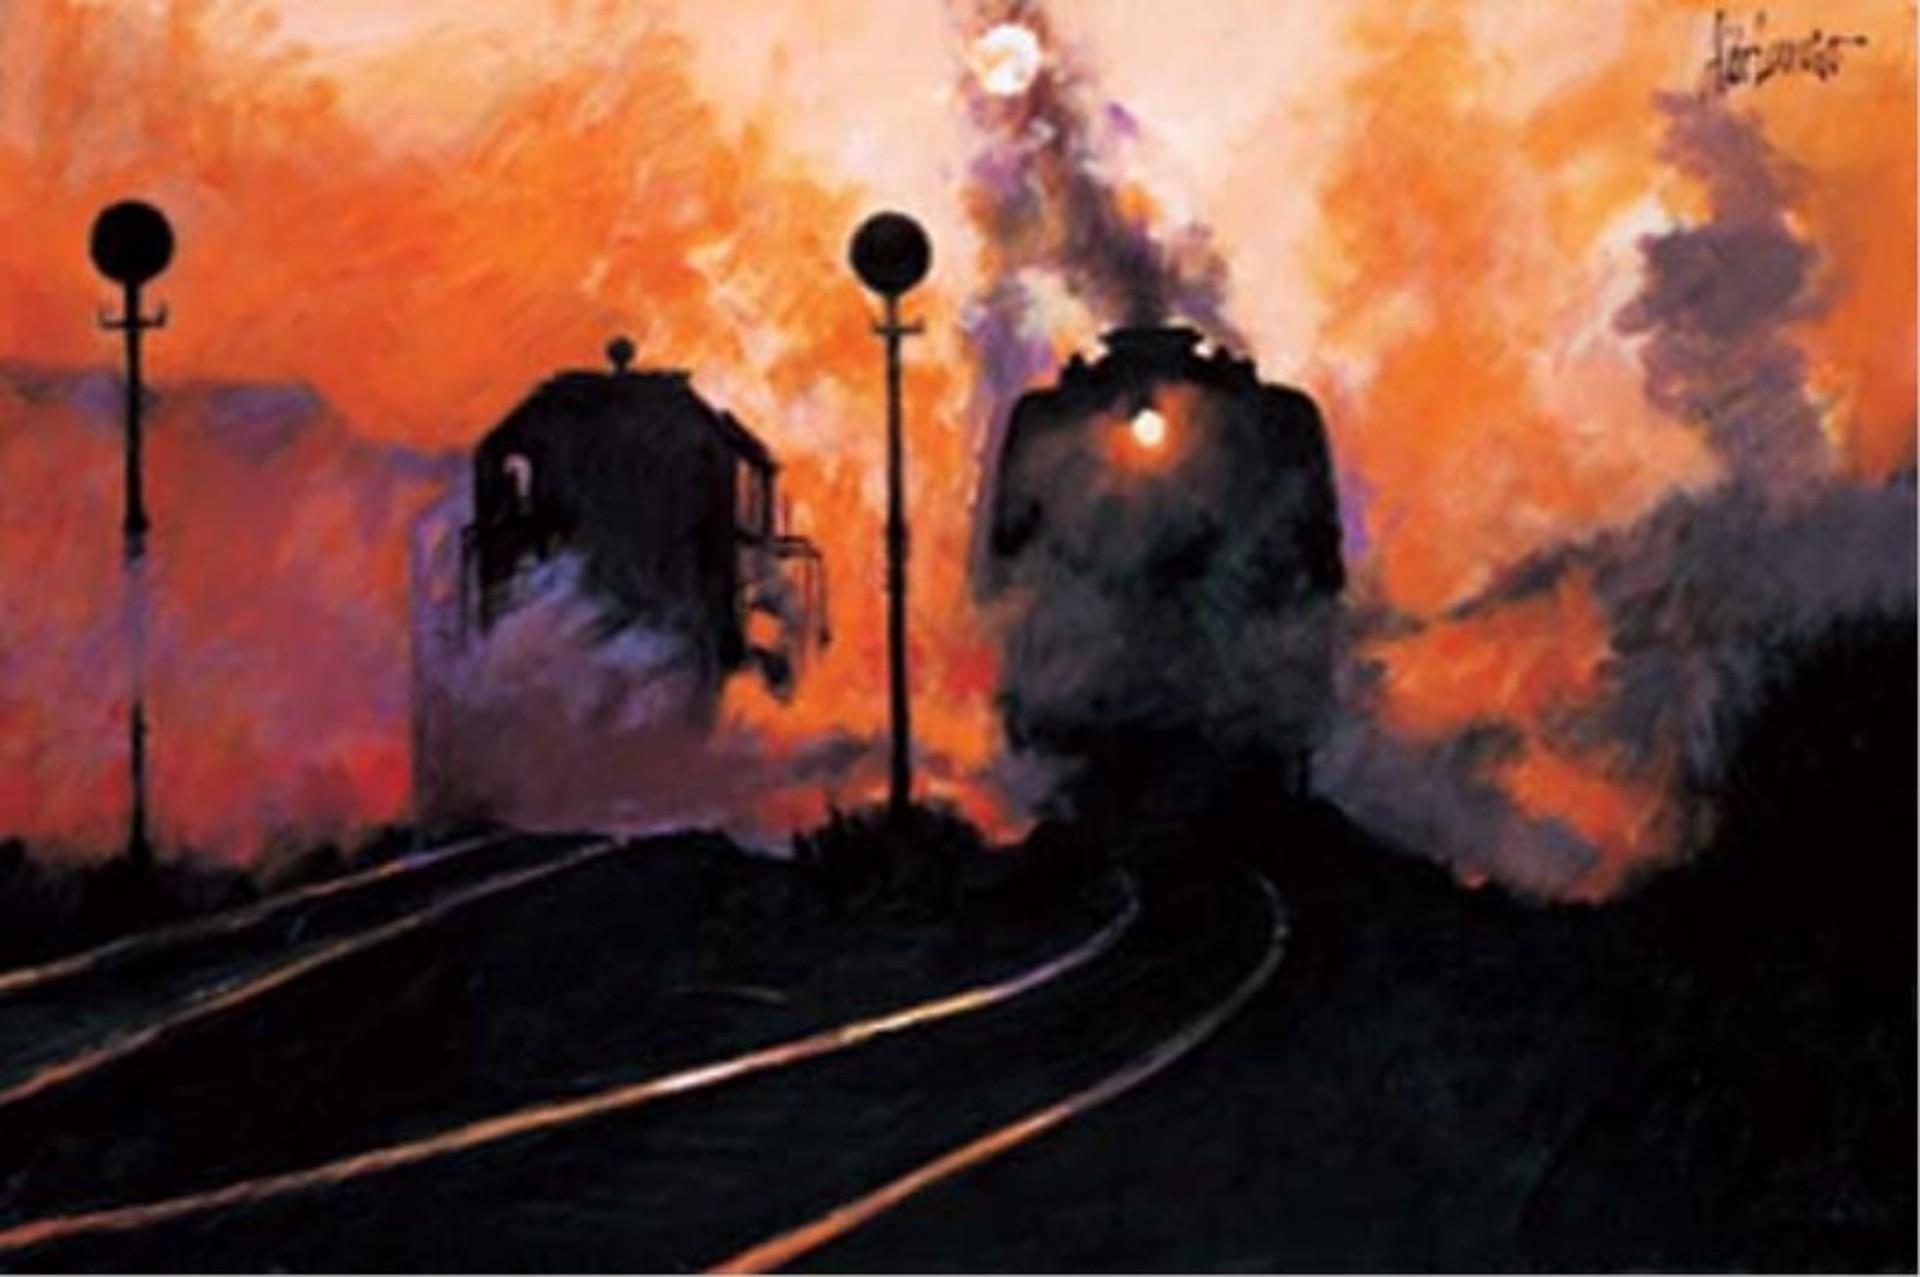 Twilight Tracks by Aldo Luongo